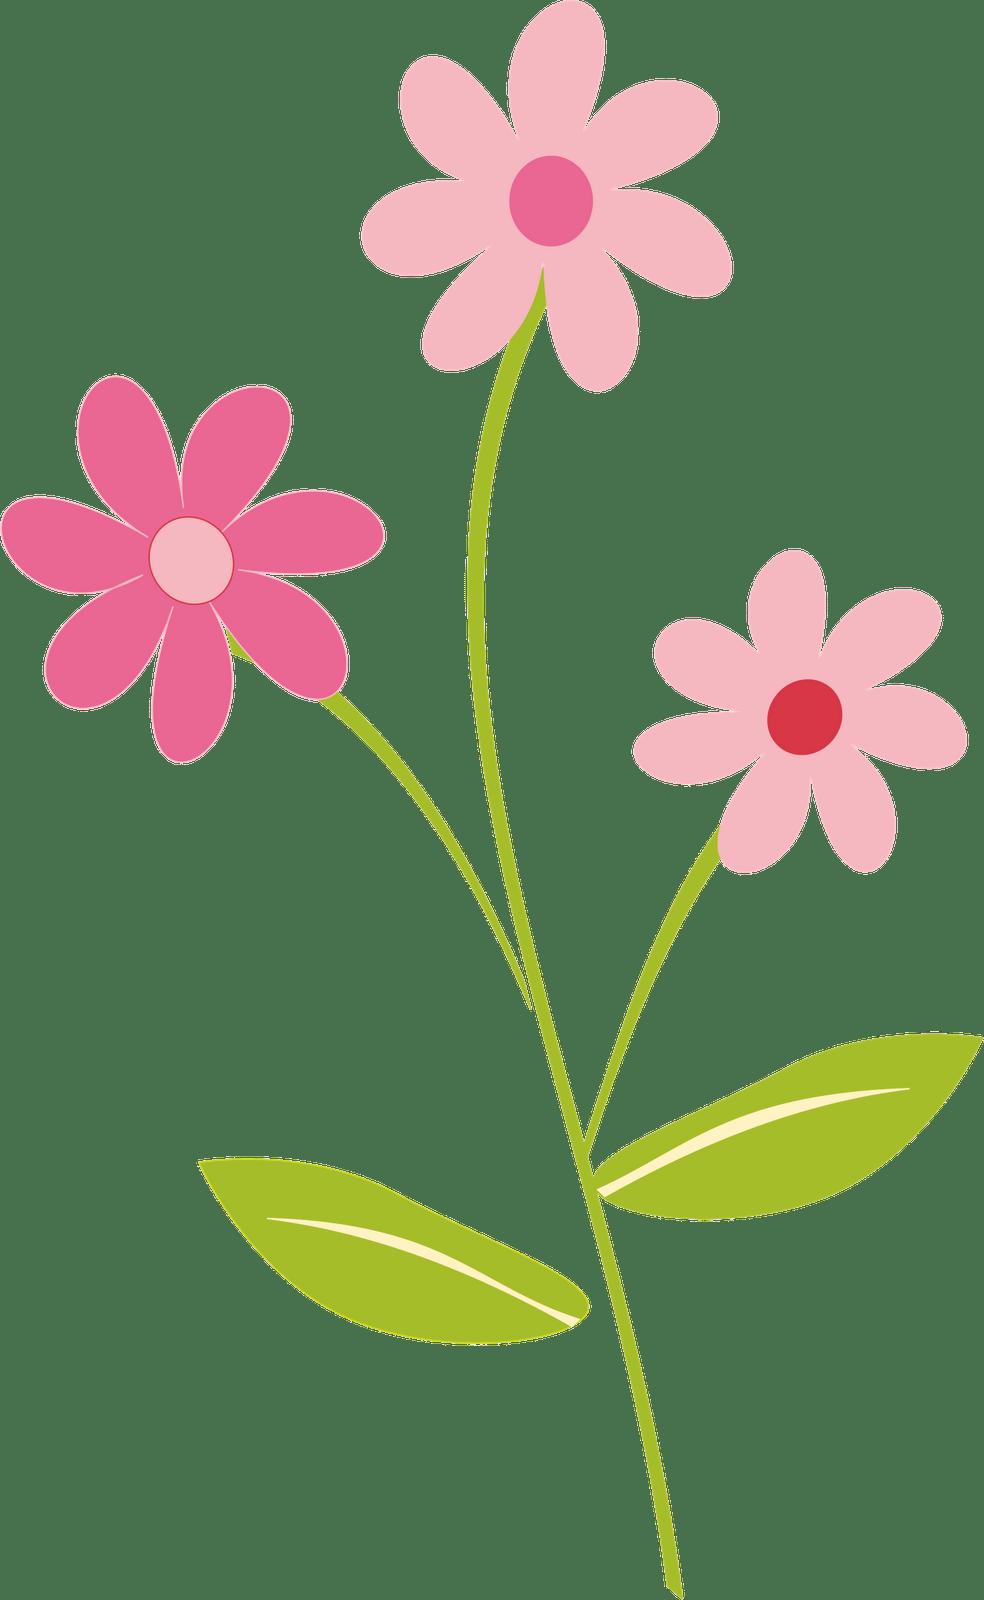 medium resolution of 984x1600 floral clipart cute